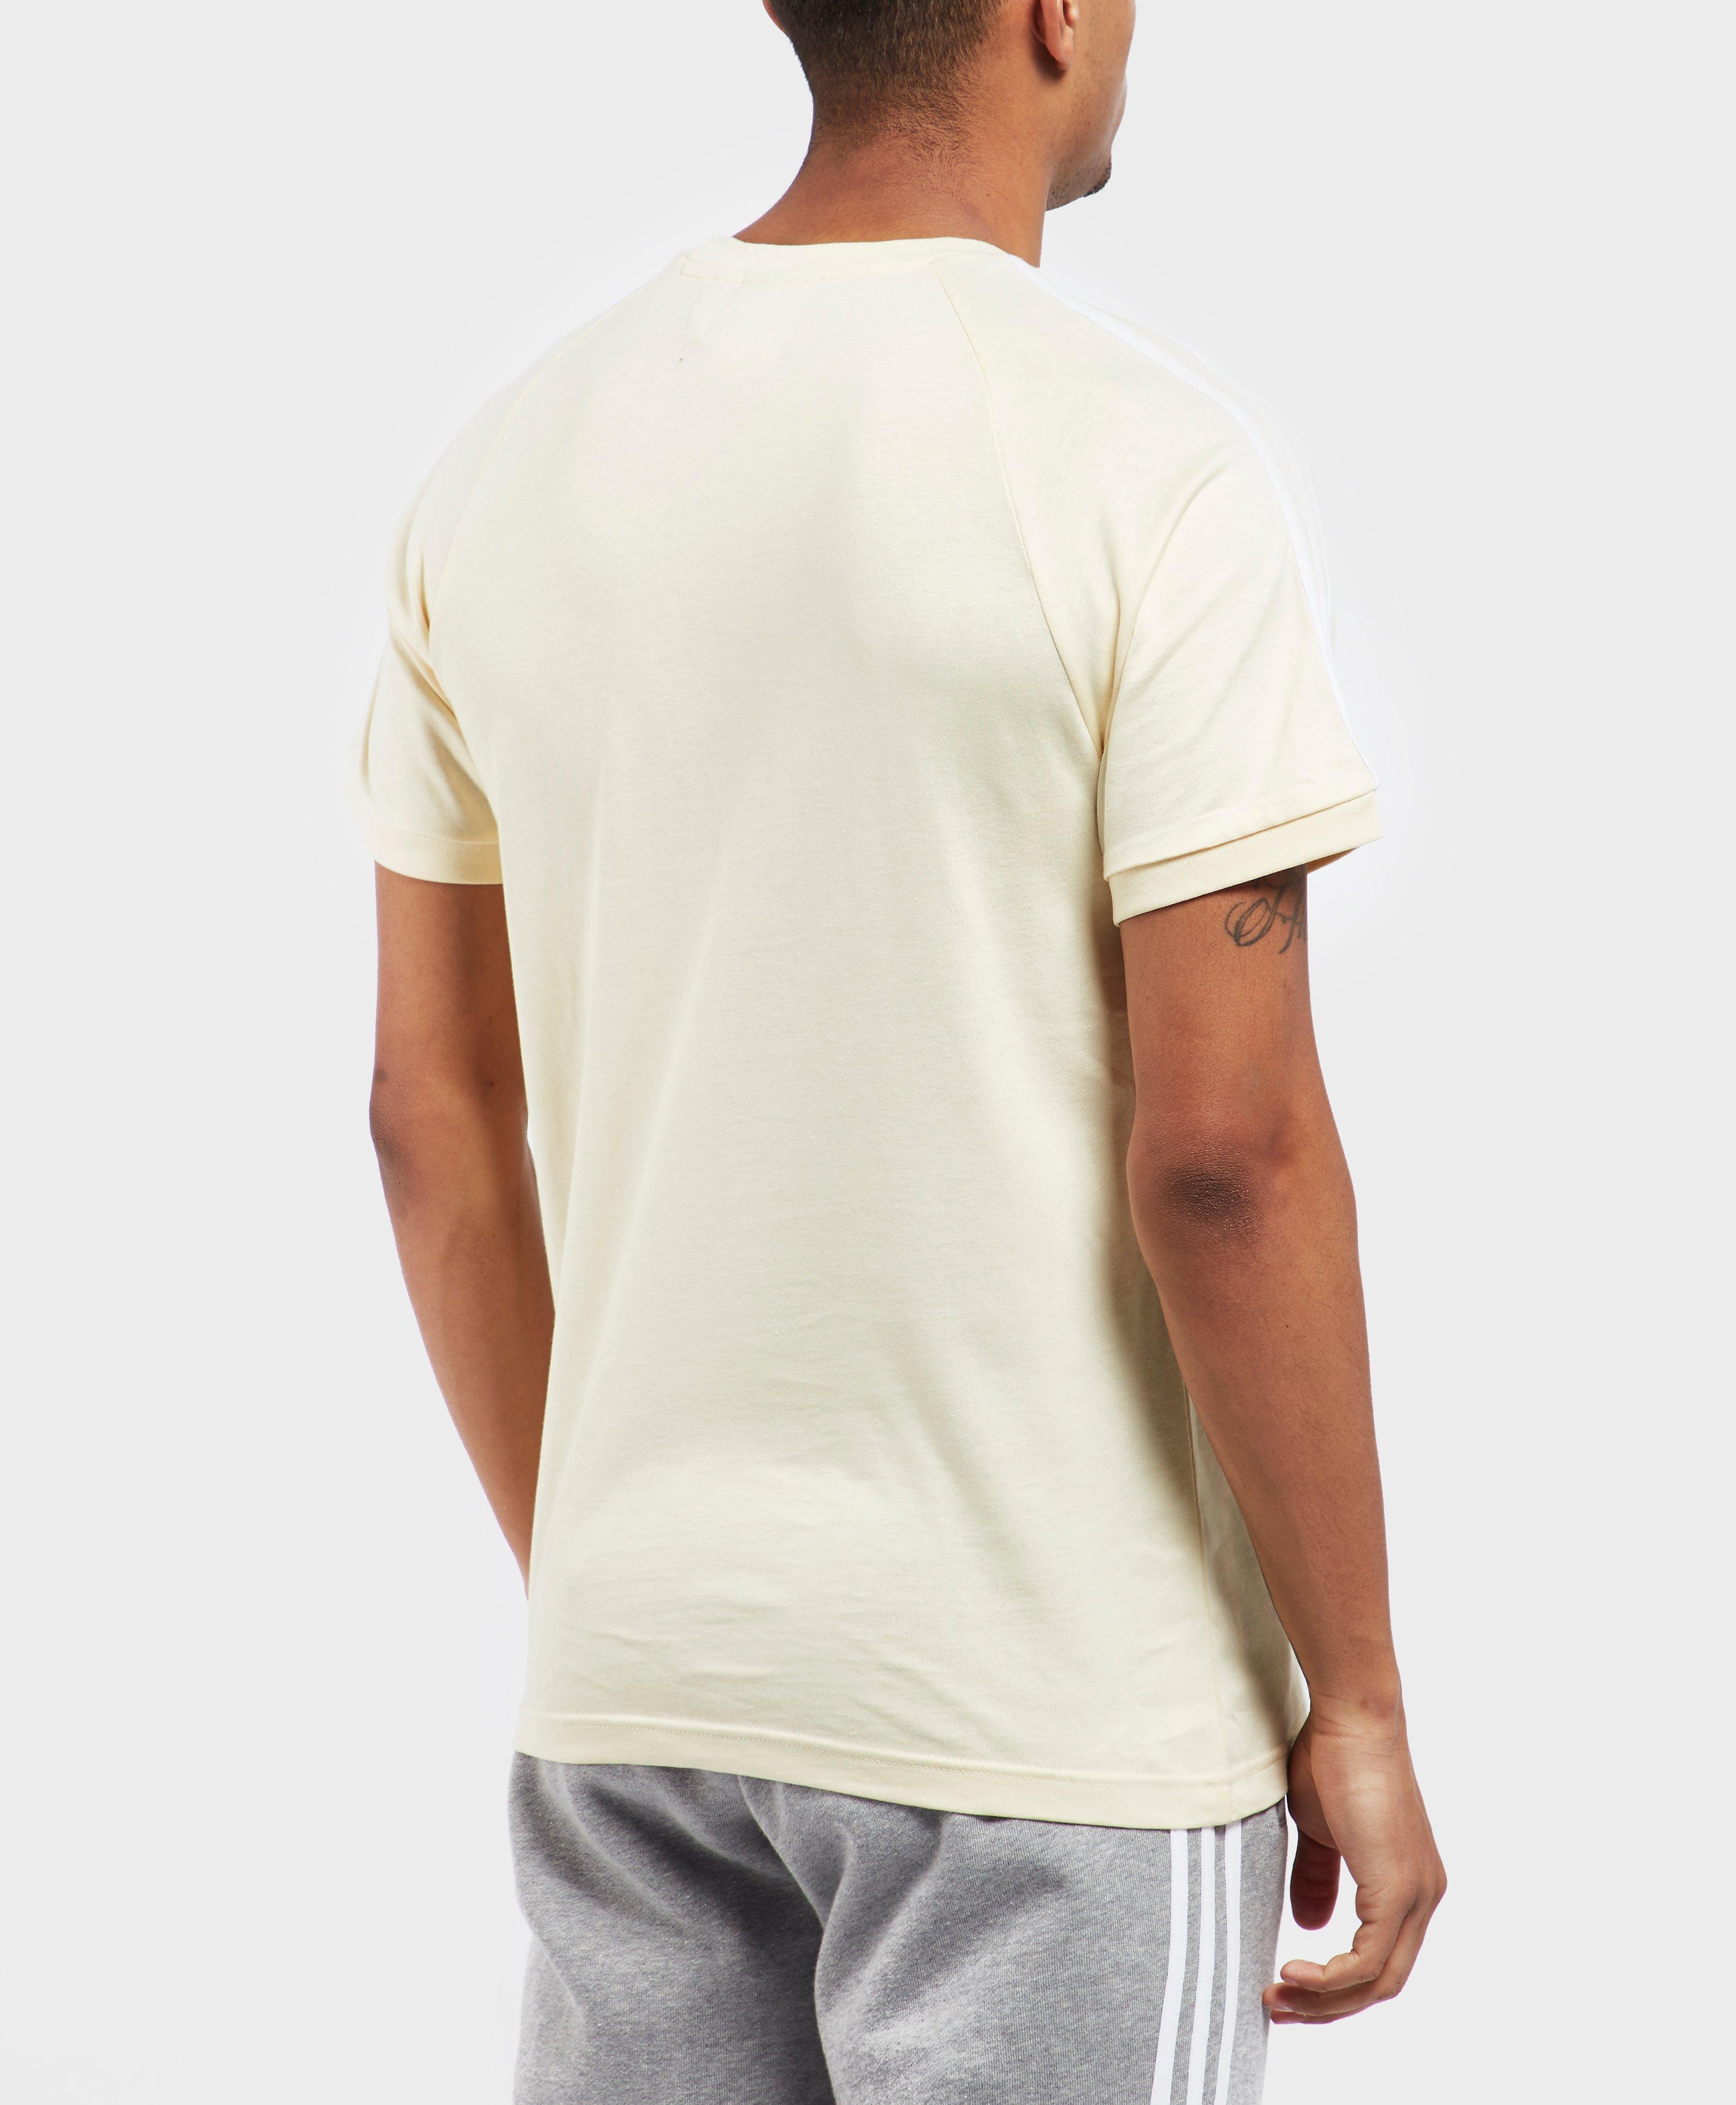 9c5259a8625 Lyst - Adidas Originals California Short Sleeve T-shirt for Men